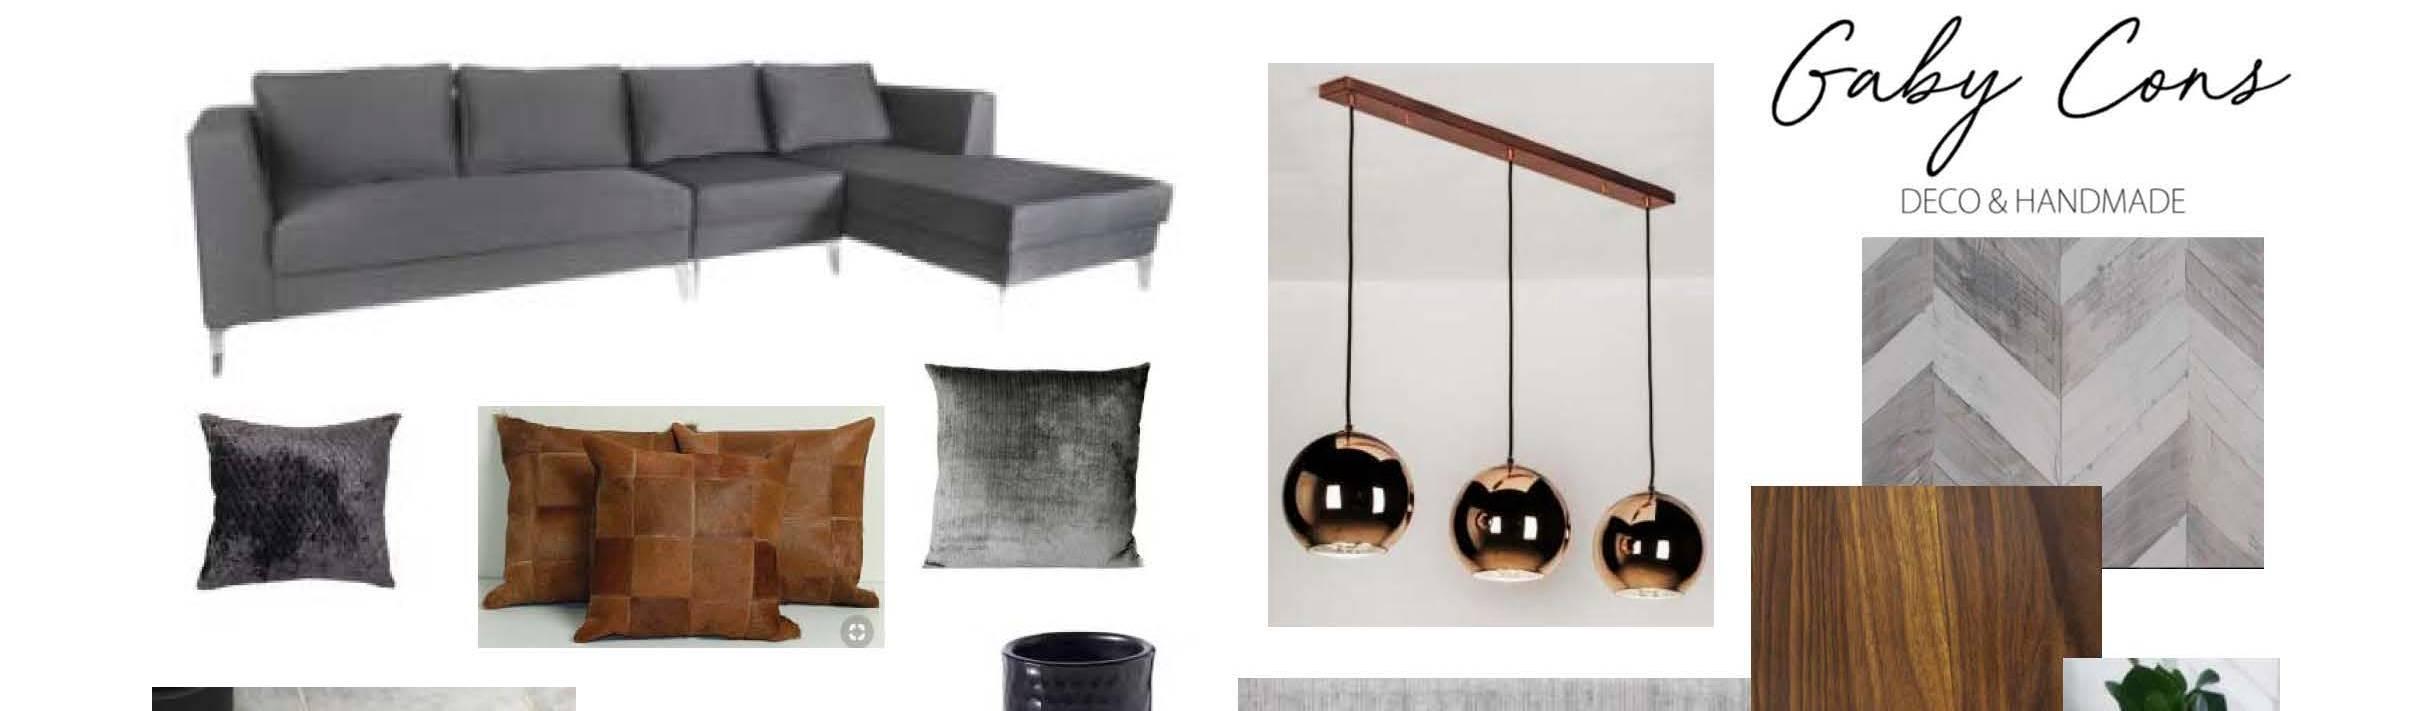 Gaby Cons Deco & Handmade